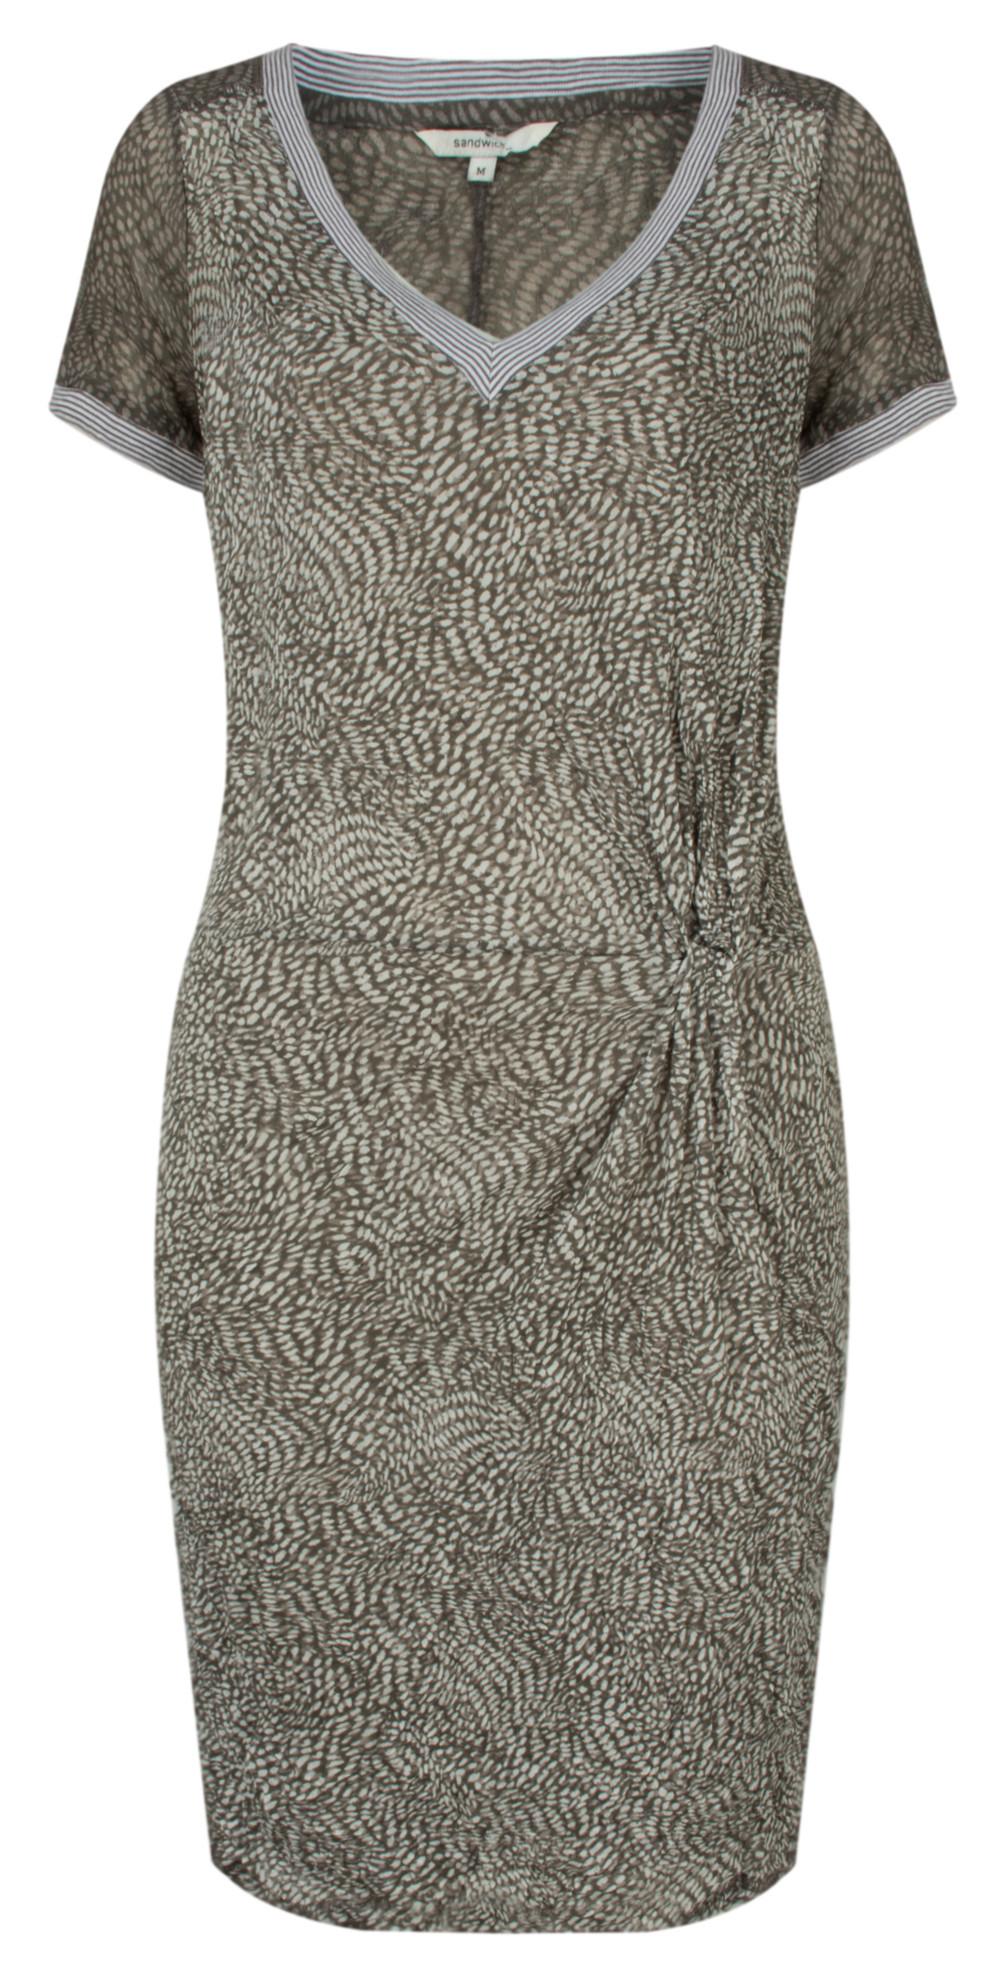 Dotted Print Short Sleeve Crinkle Dress main image